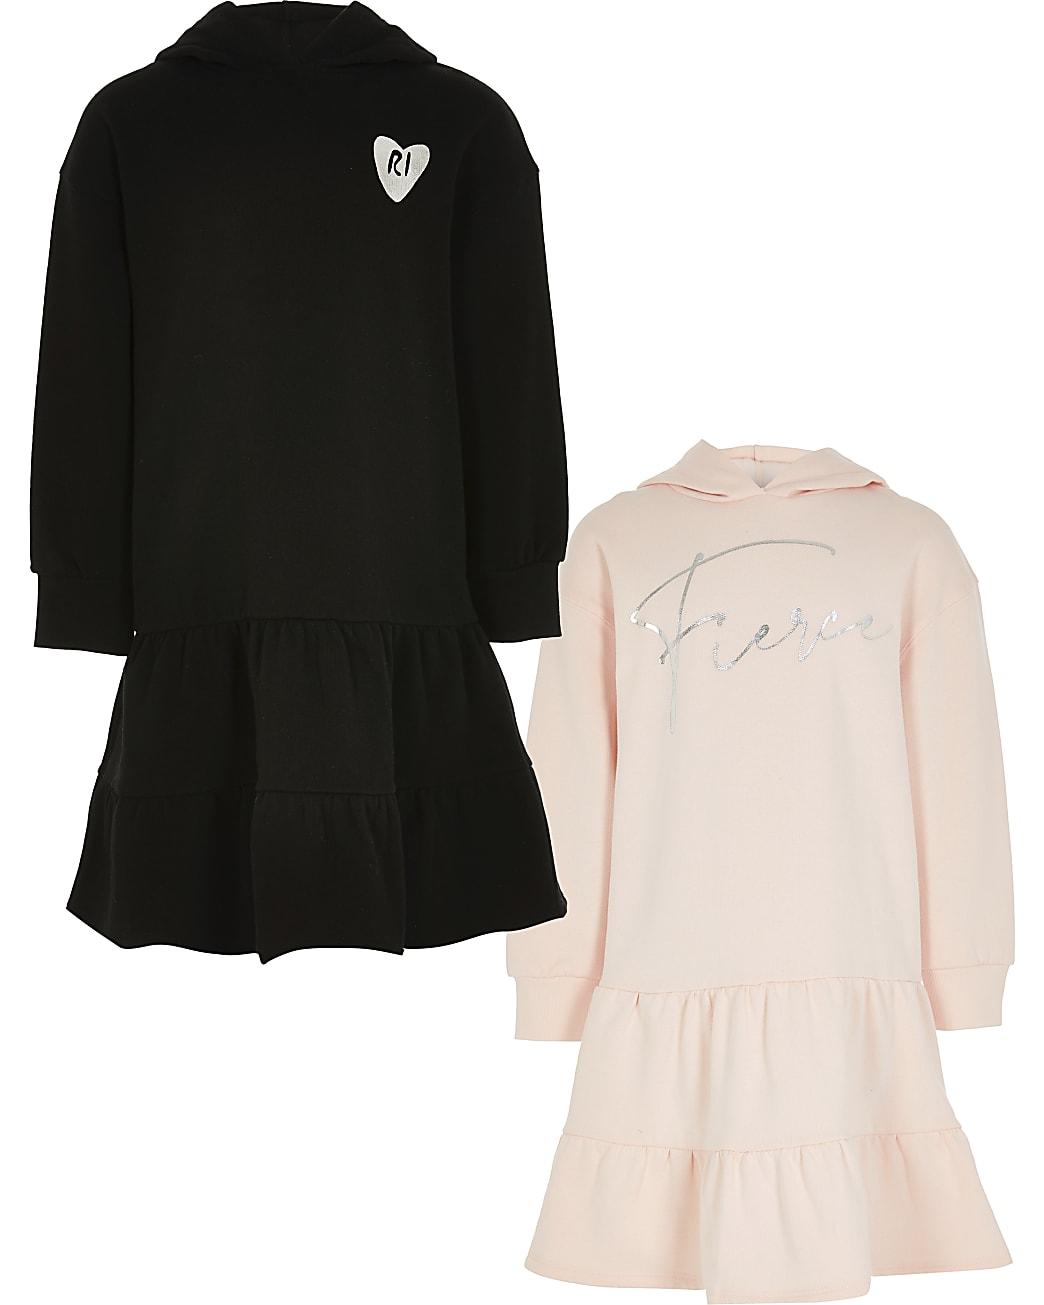 Girls pink hooded sweatshirt dress 2 pack